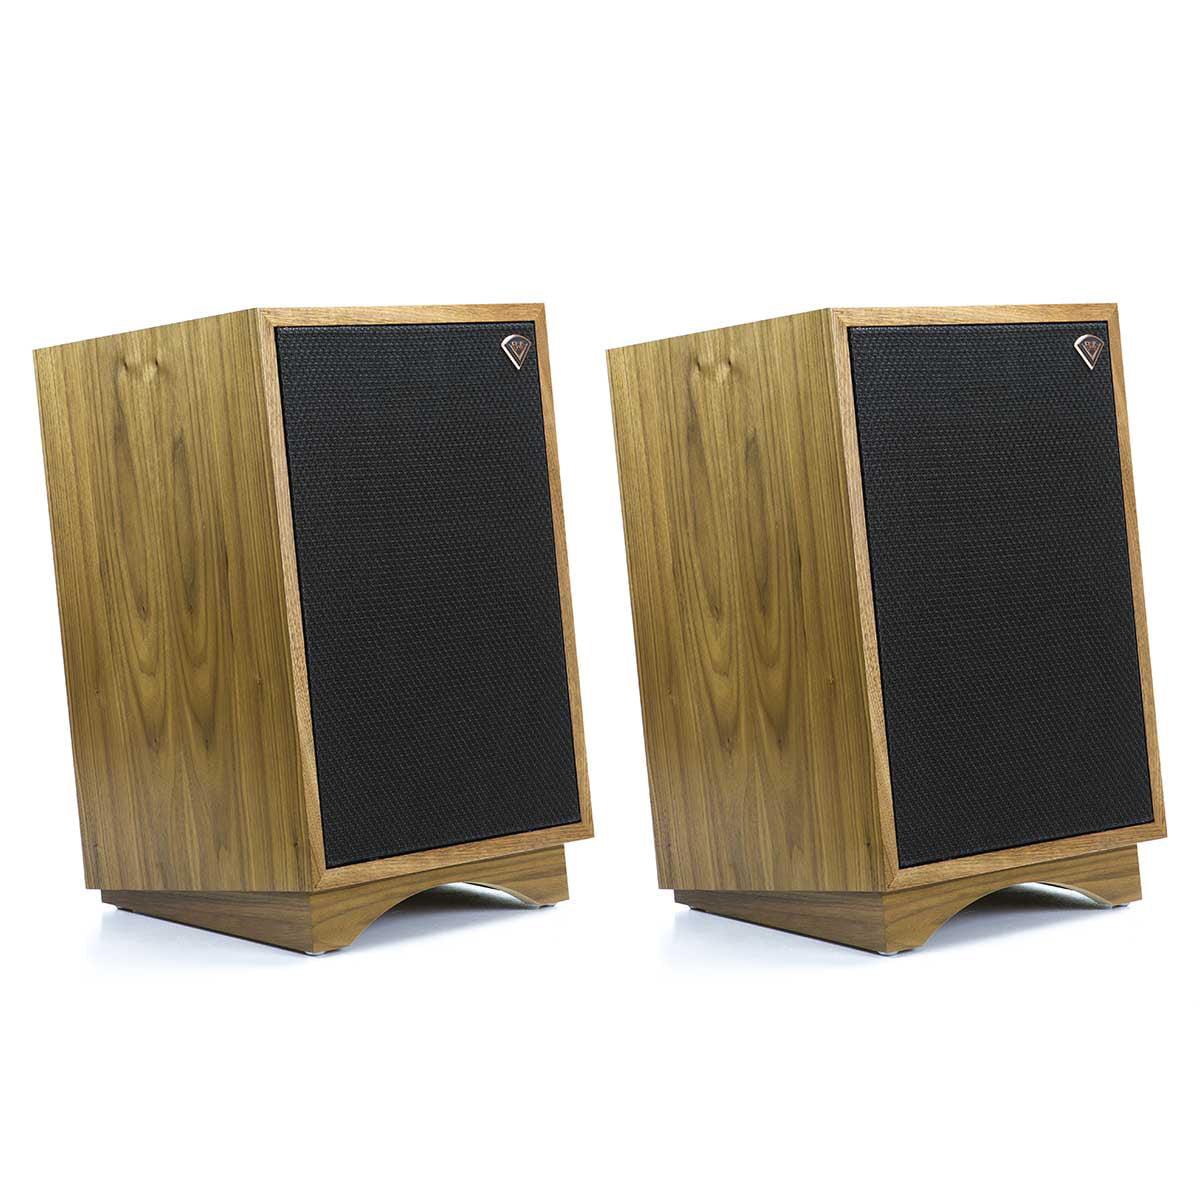 Klipsch Heresy III Heritage Series Floorstanding Speakers Pair by Klipsch